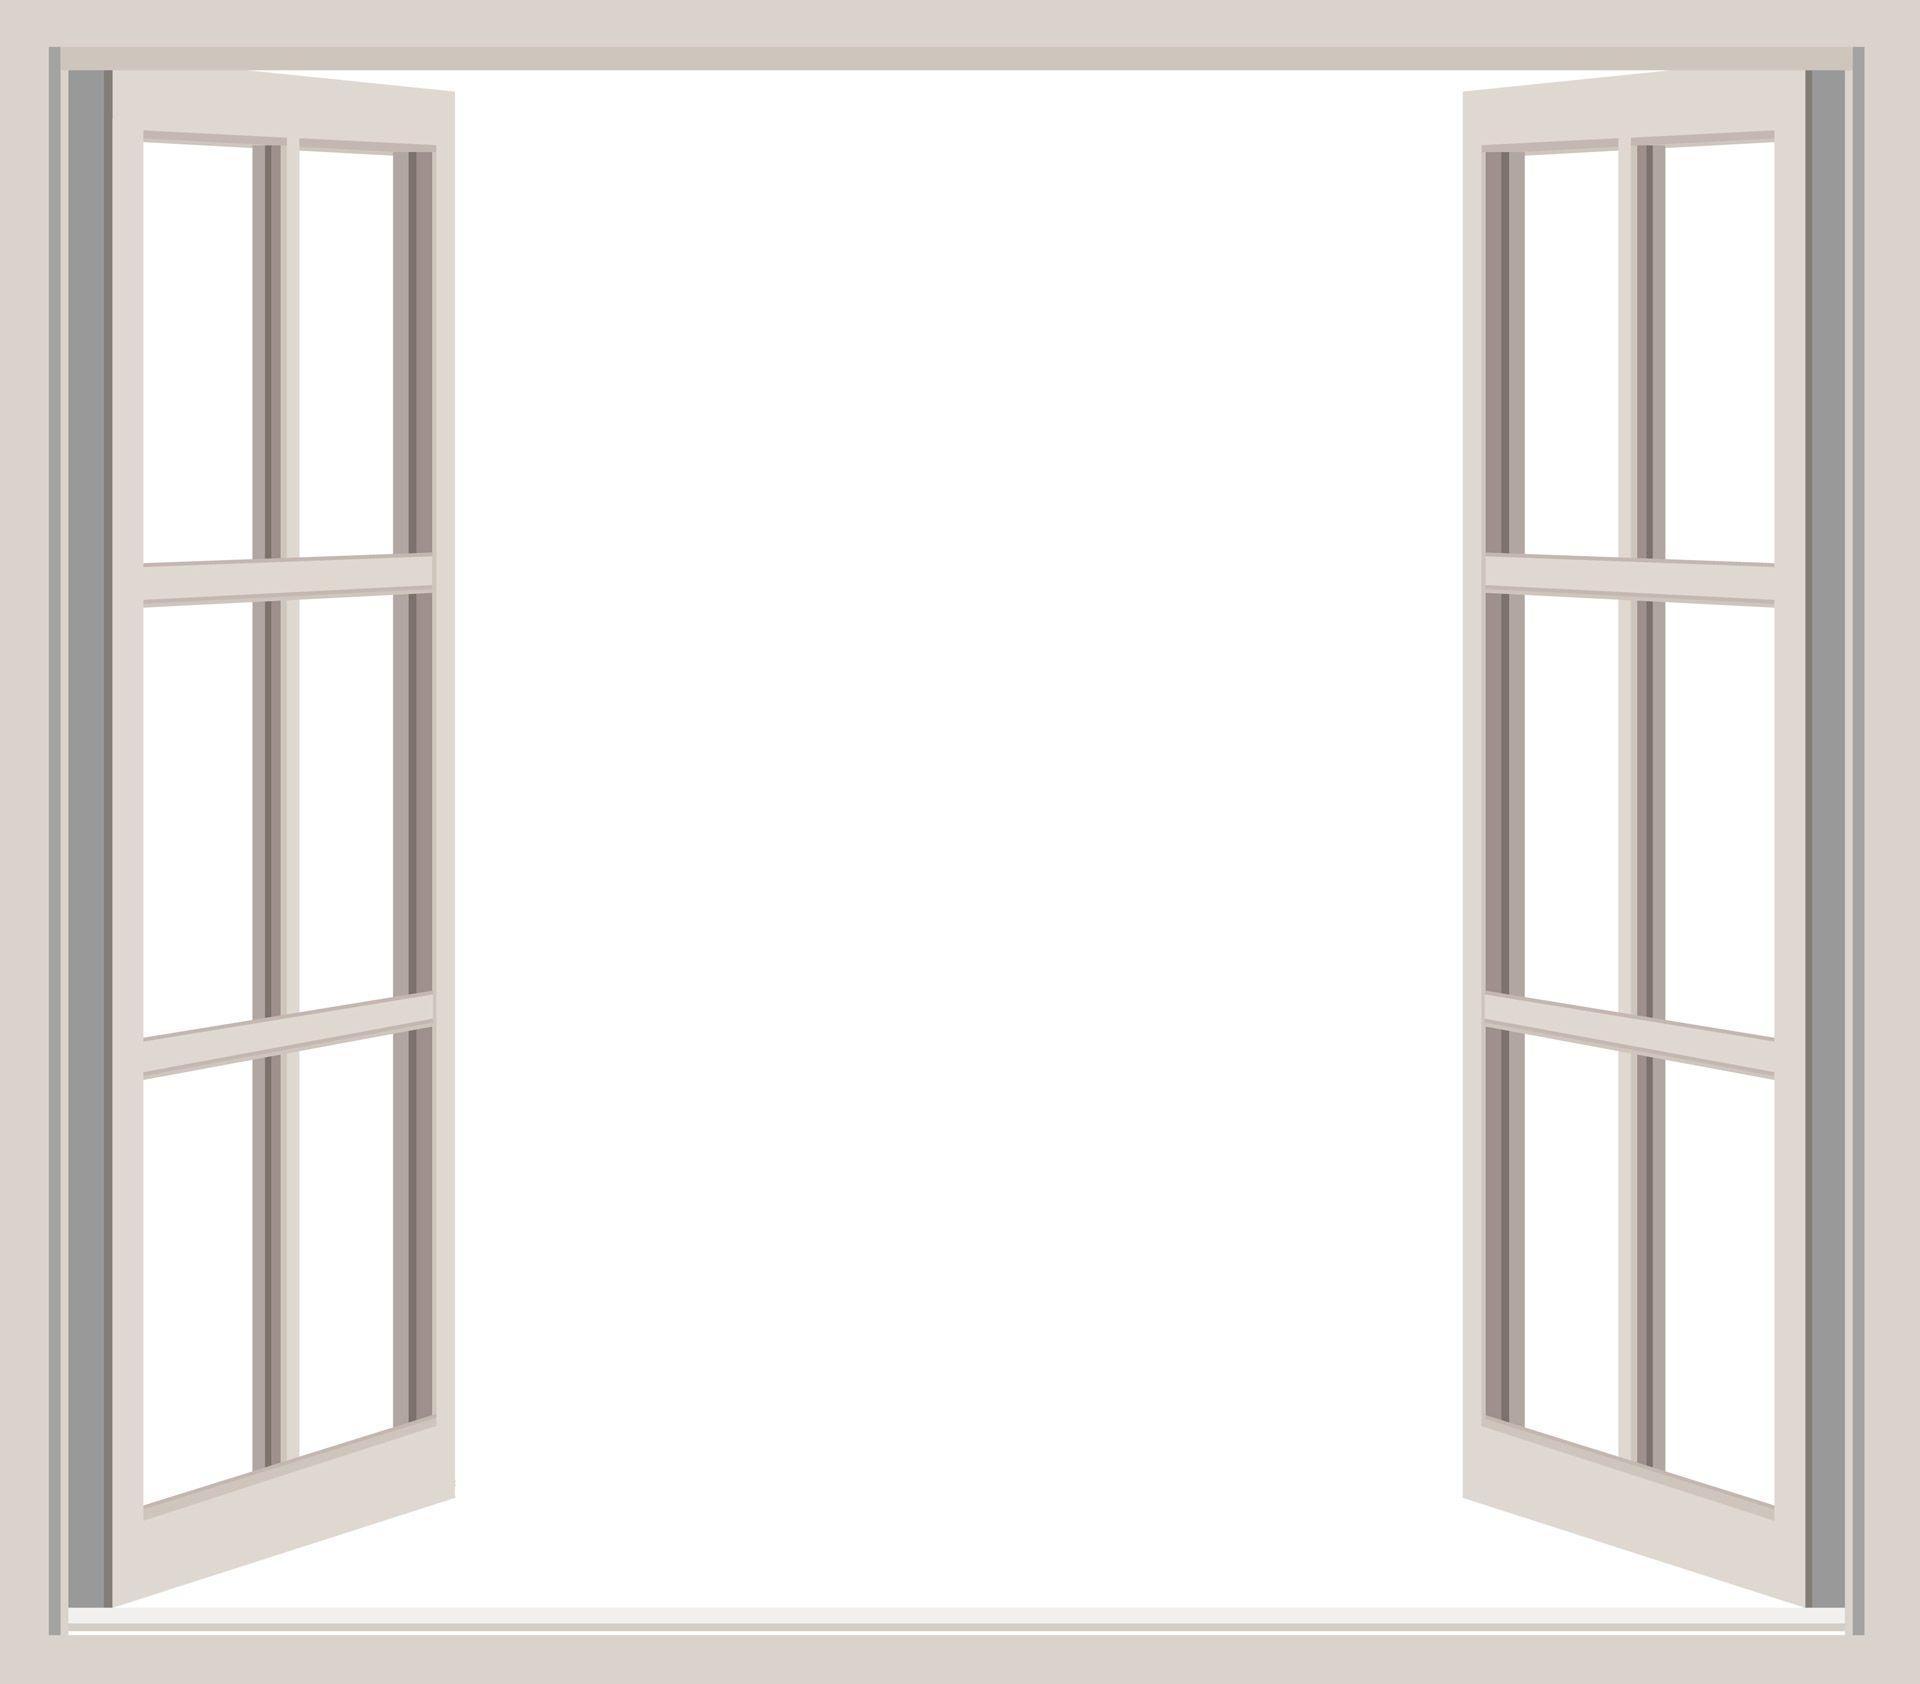 Window frame clipart | frames | Pinterest | Window frames, Open ...